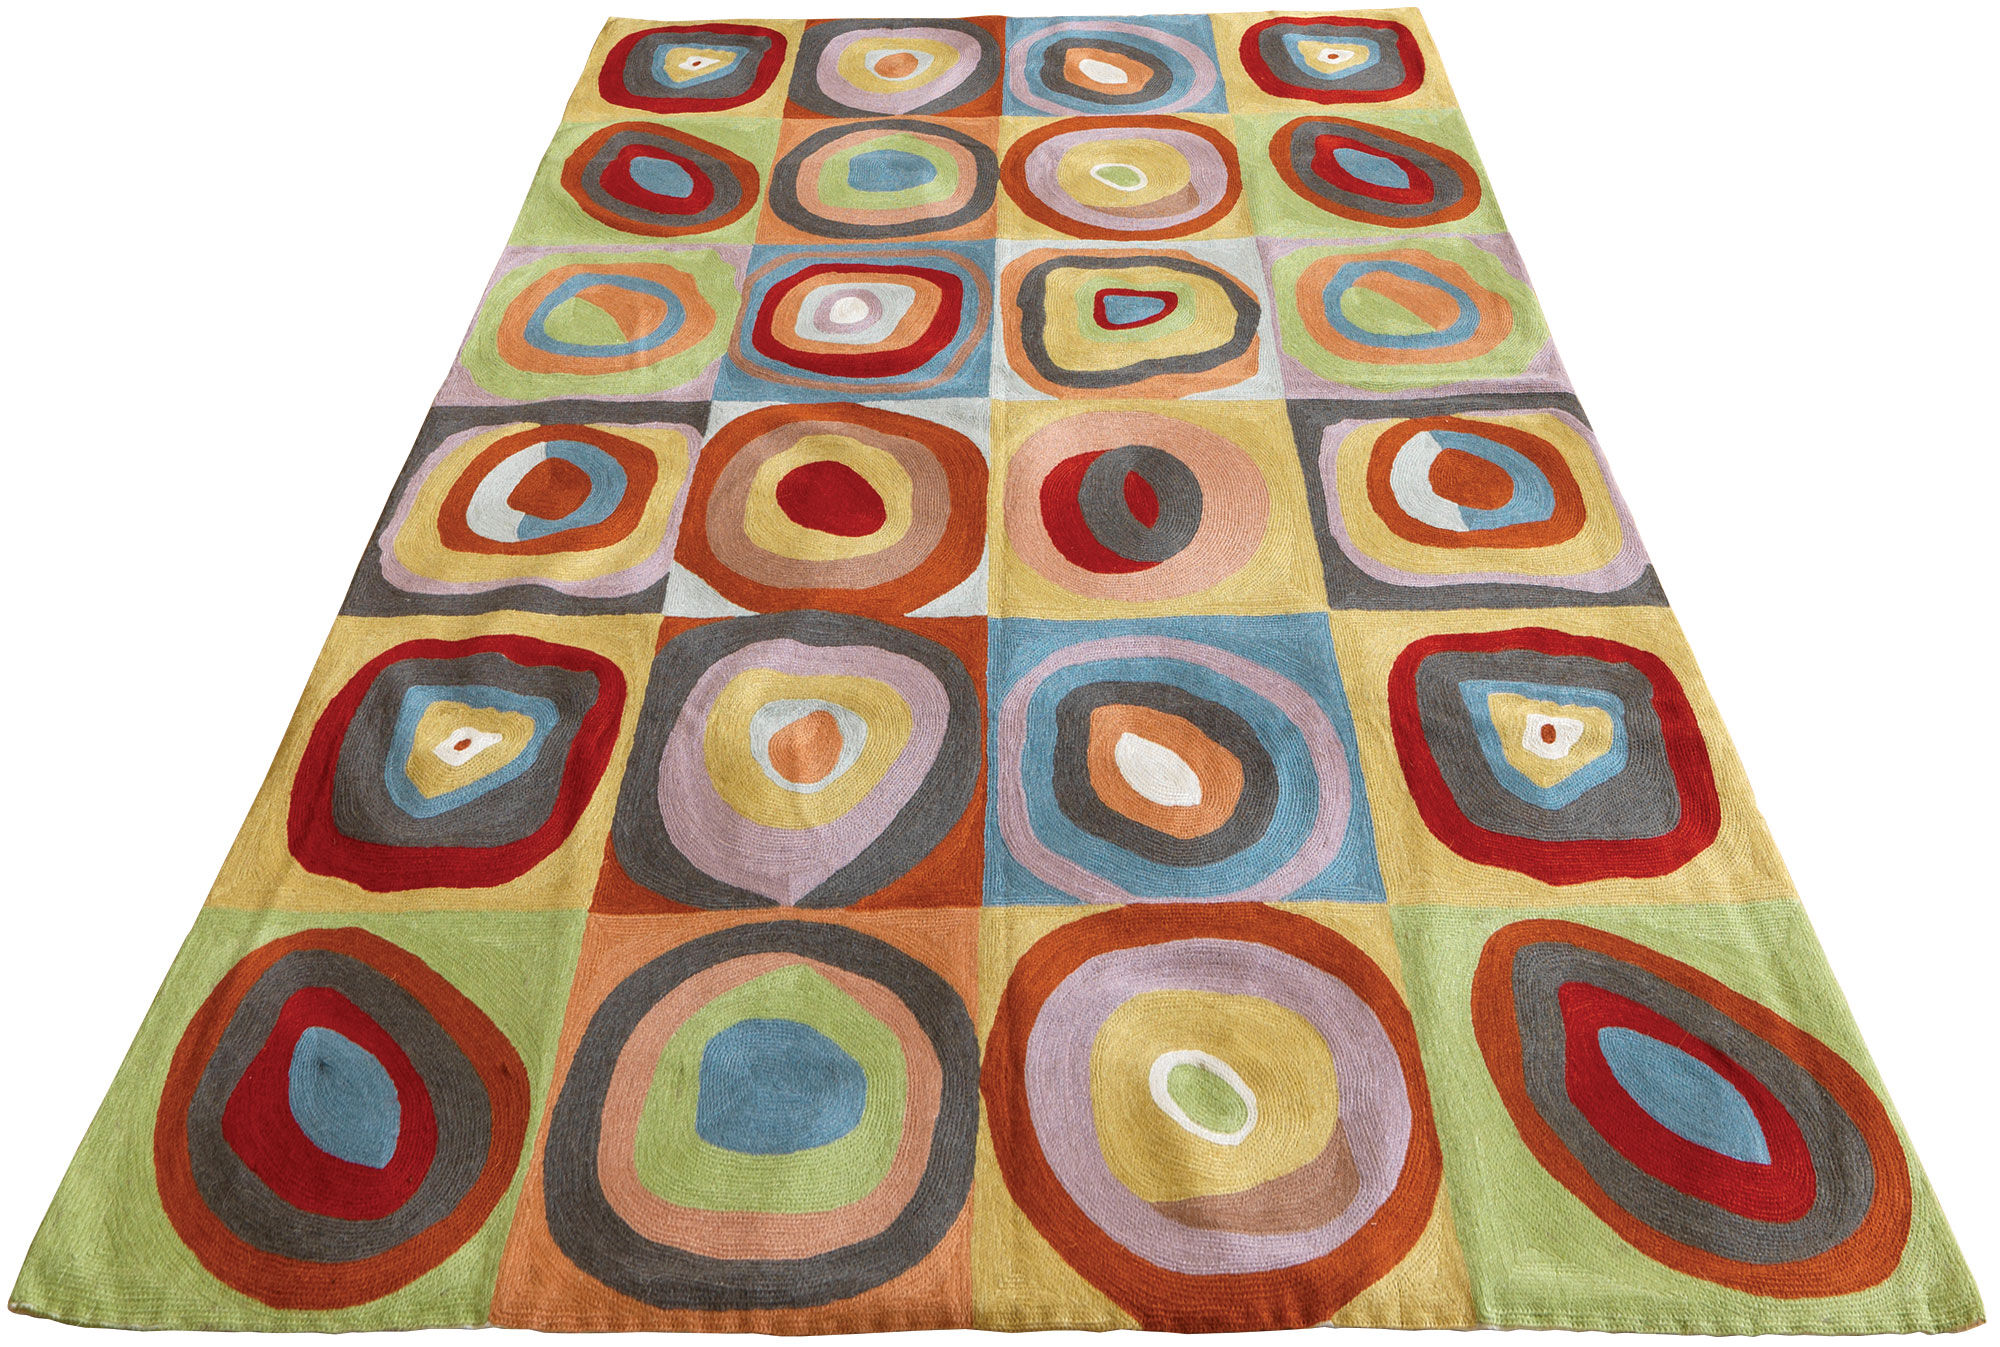 Wassily Kandinsky Teppich Farbstudie Quadrate (1913